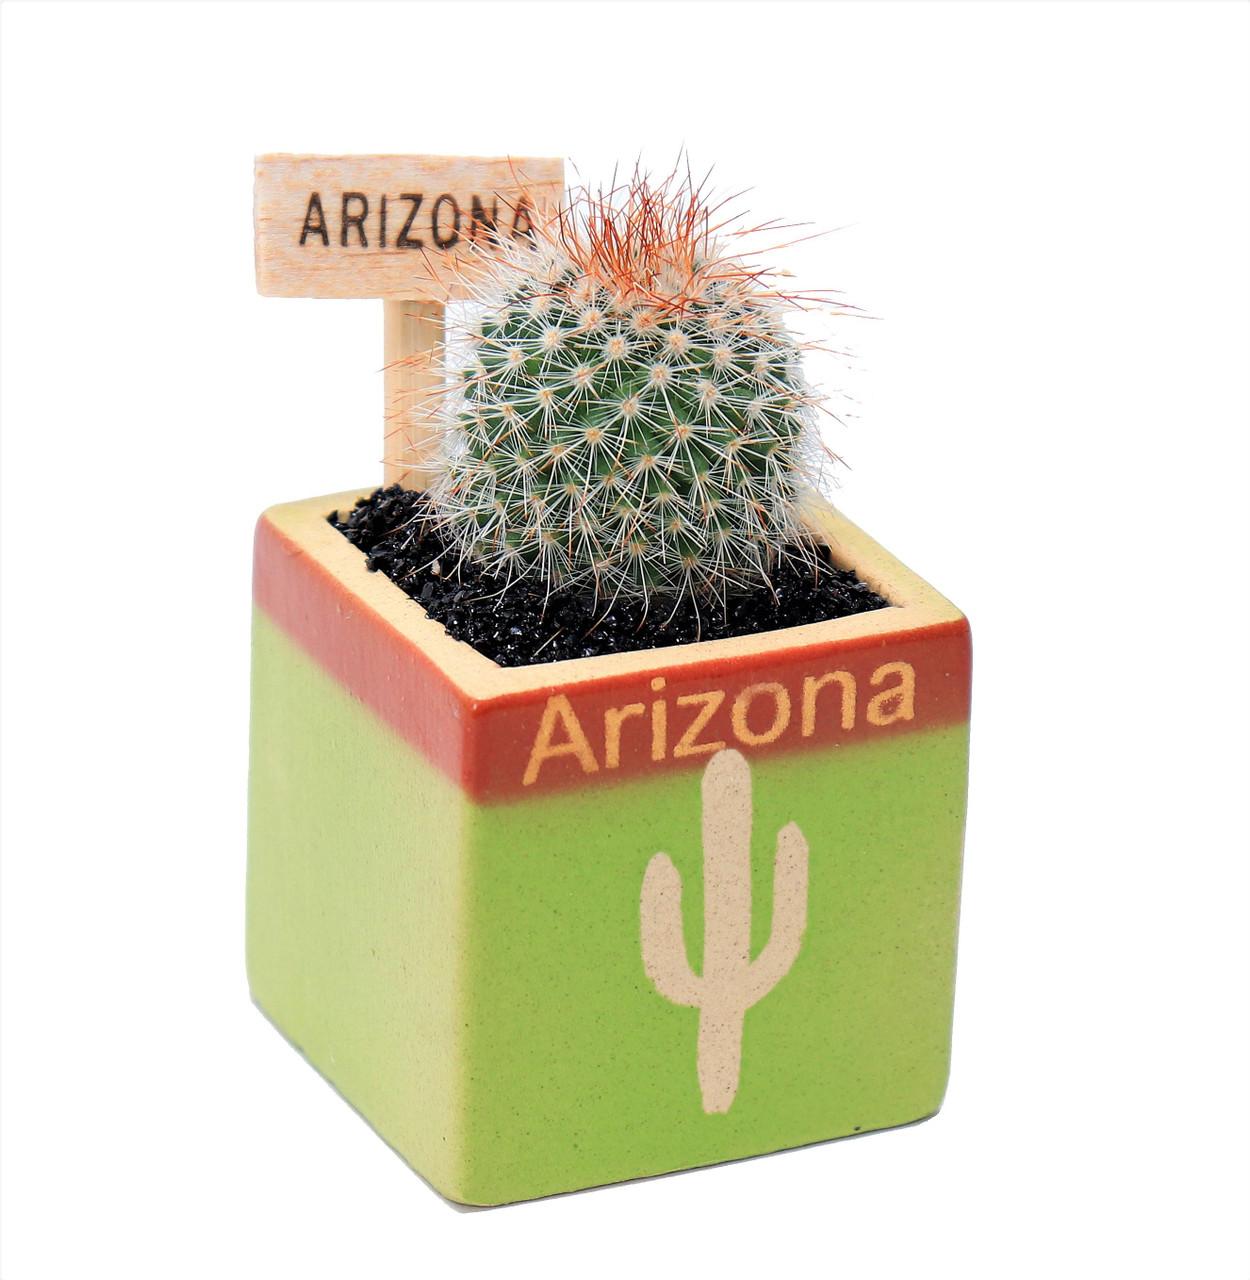 Arizona Cactus Green Cube